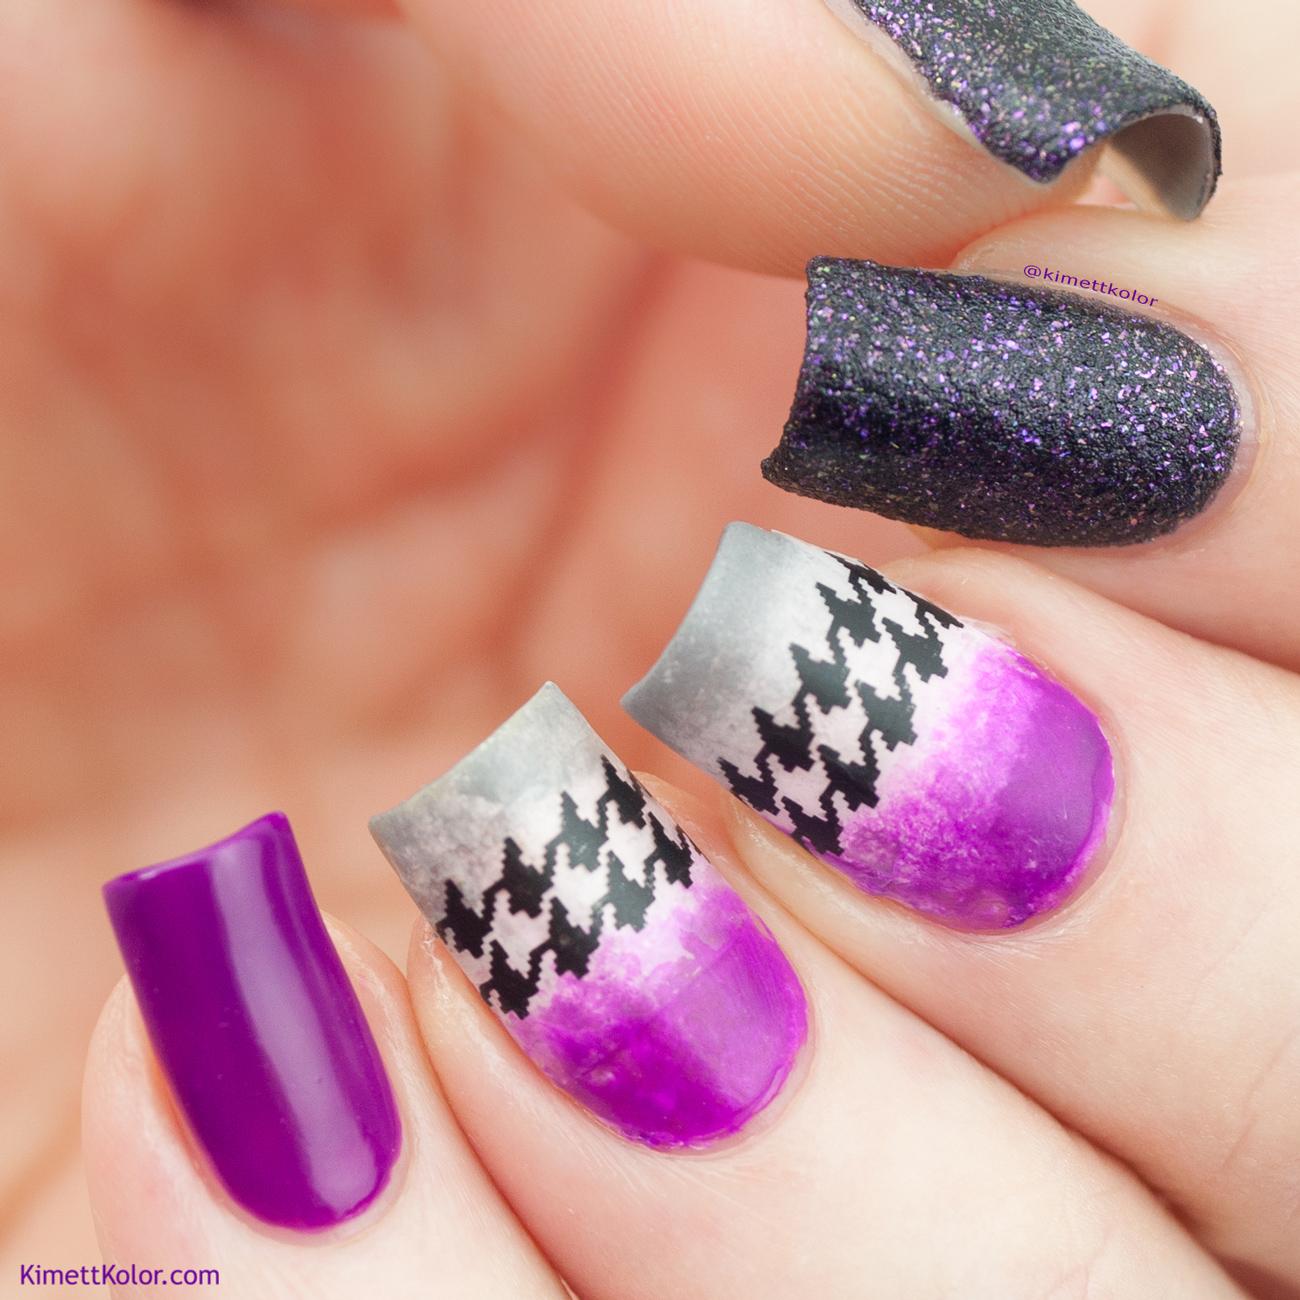 KimettKolor Purple and Houndstooth Nail Art